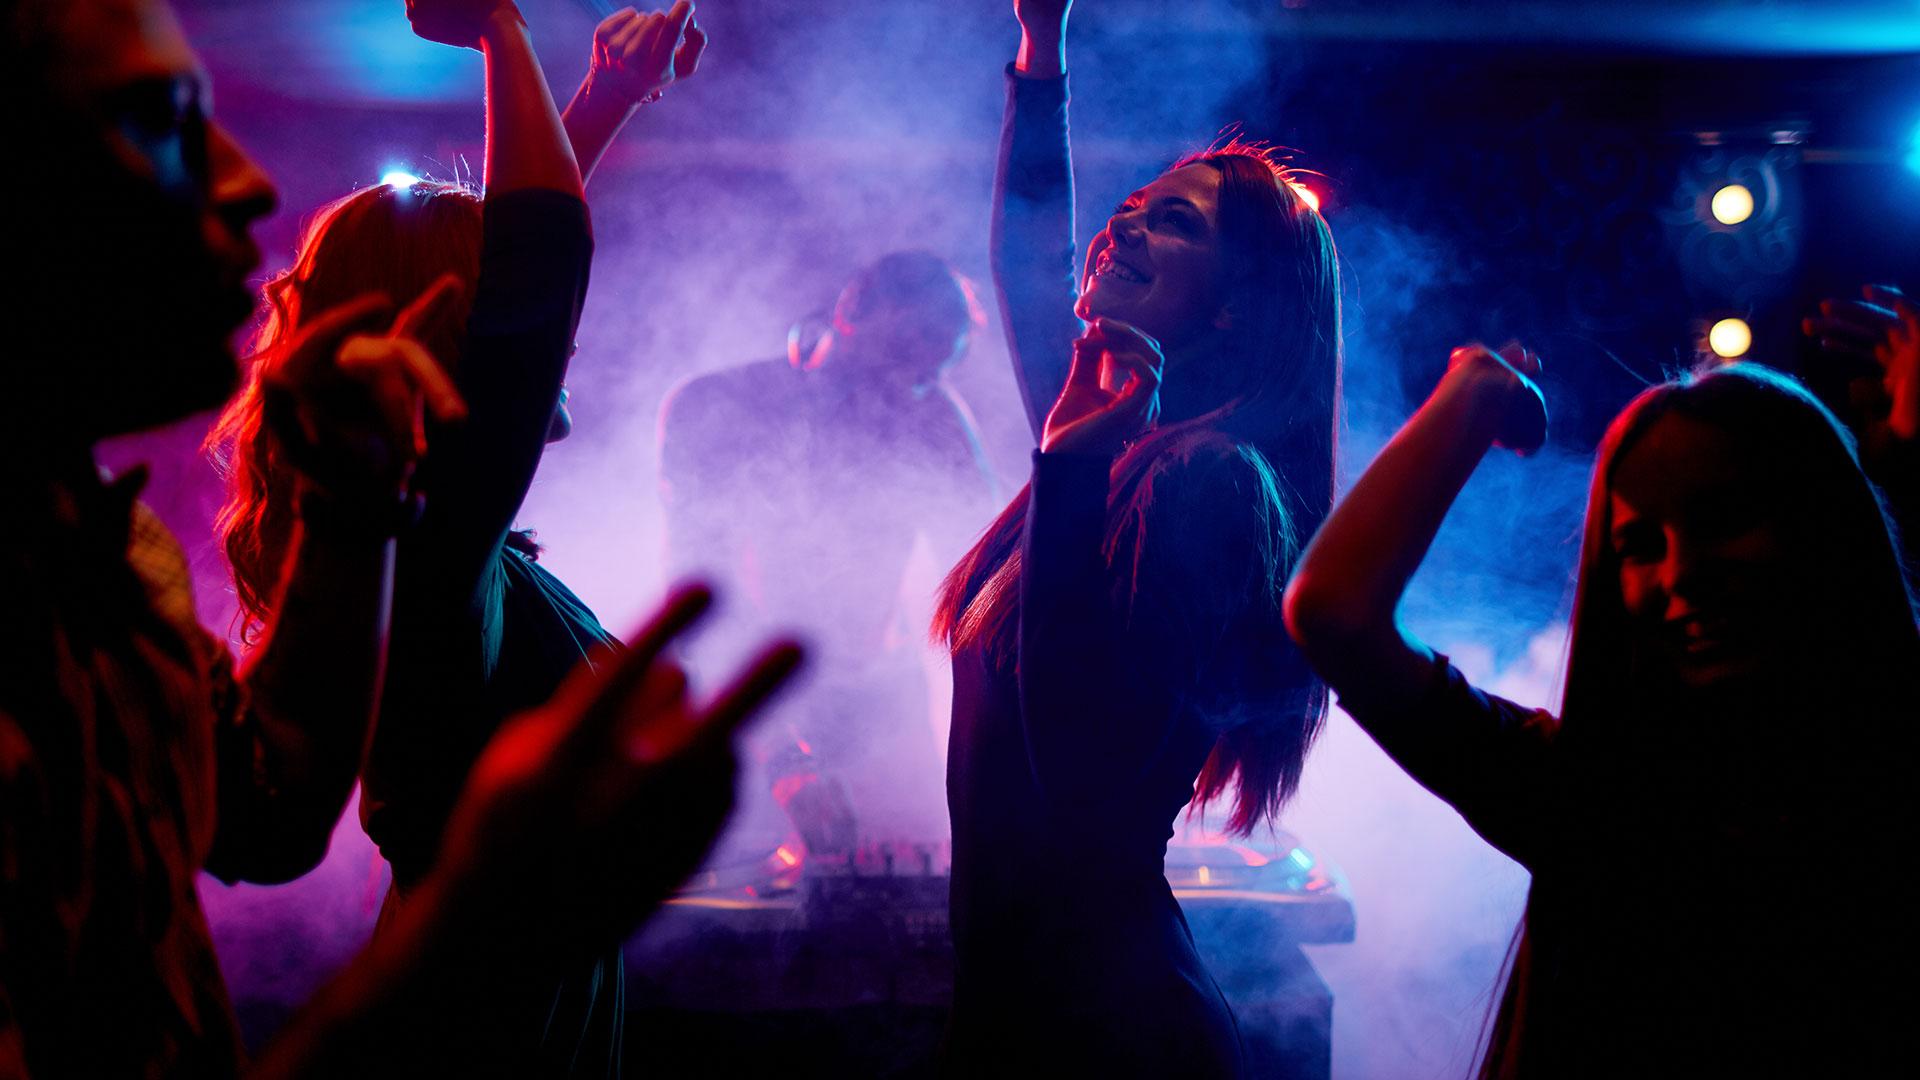 nattklubb babes rövsex i Stockholm